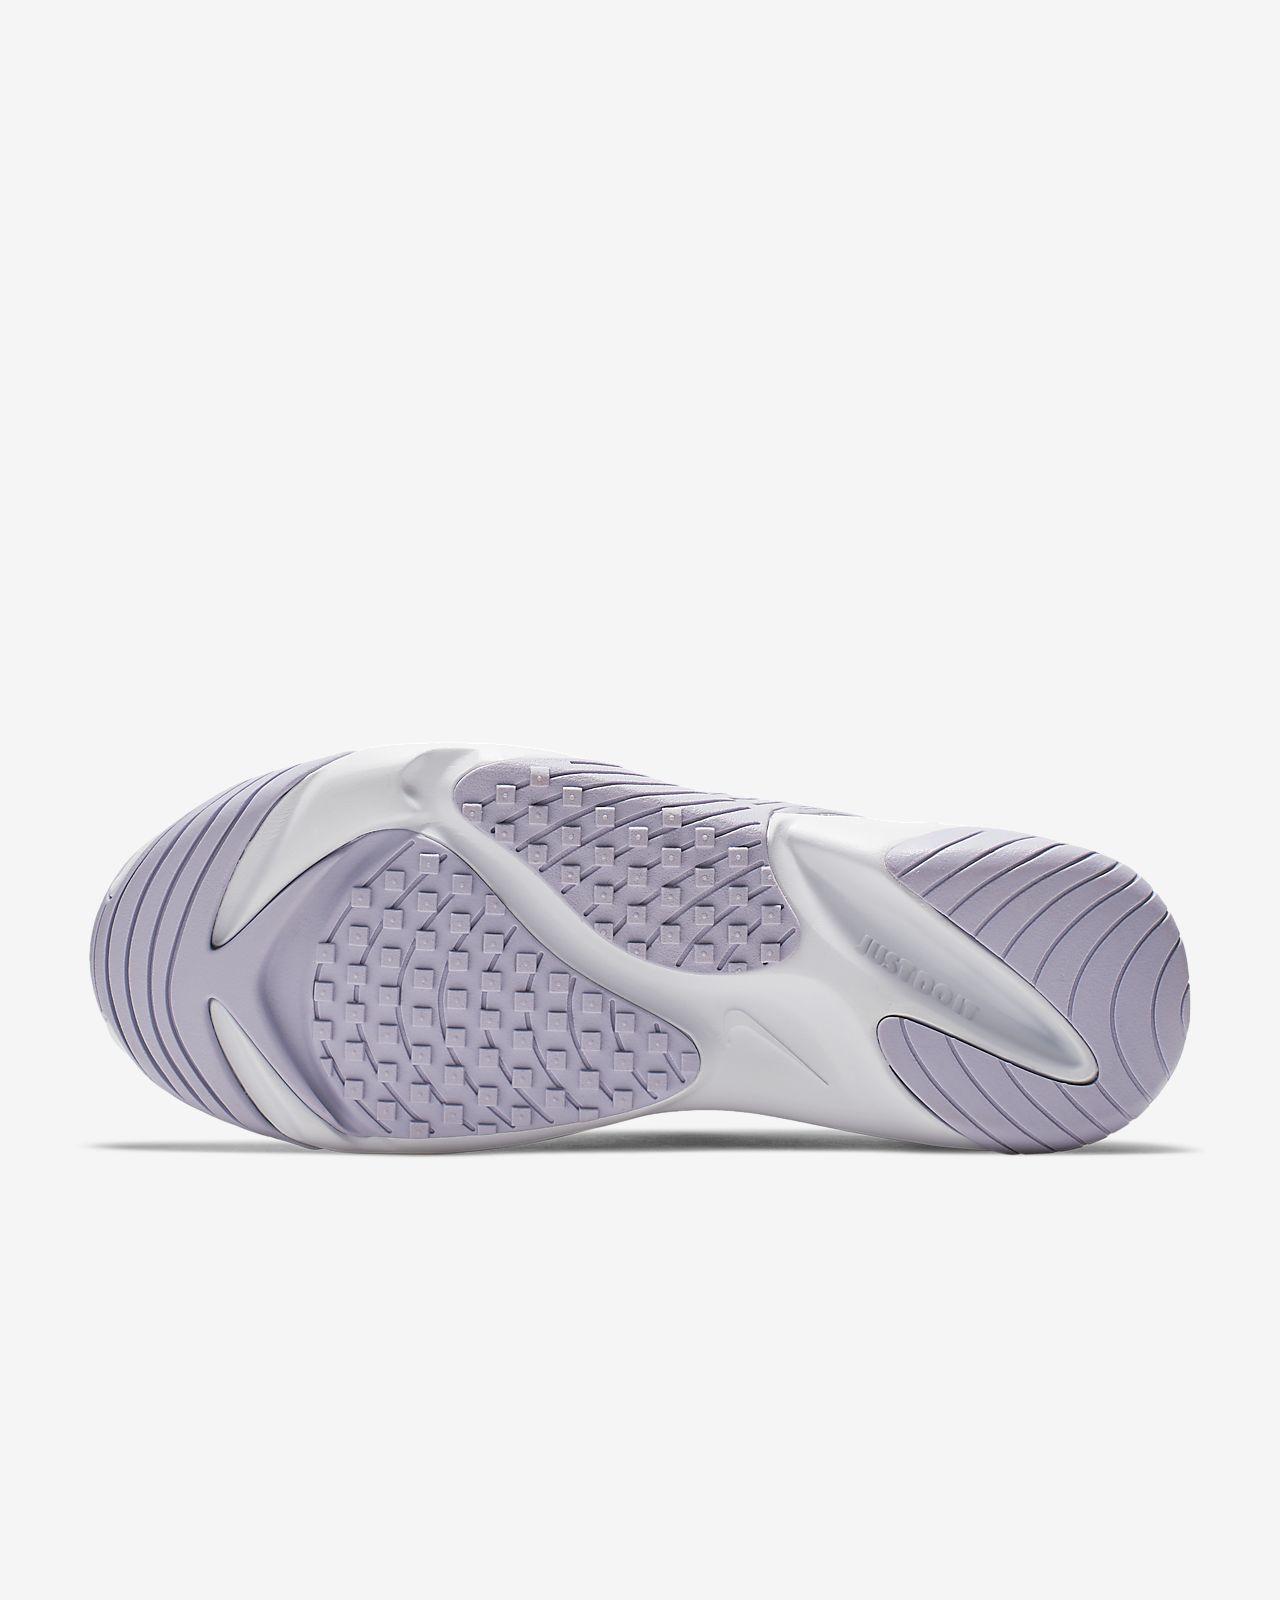 6434711187ca Nike Zoom 2K Women s Shoe. Nike.com NL